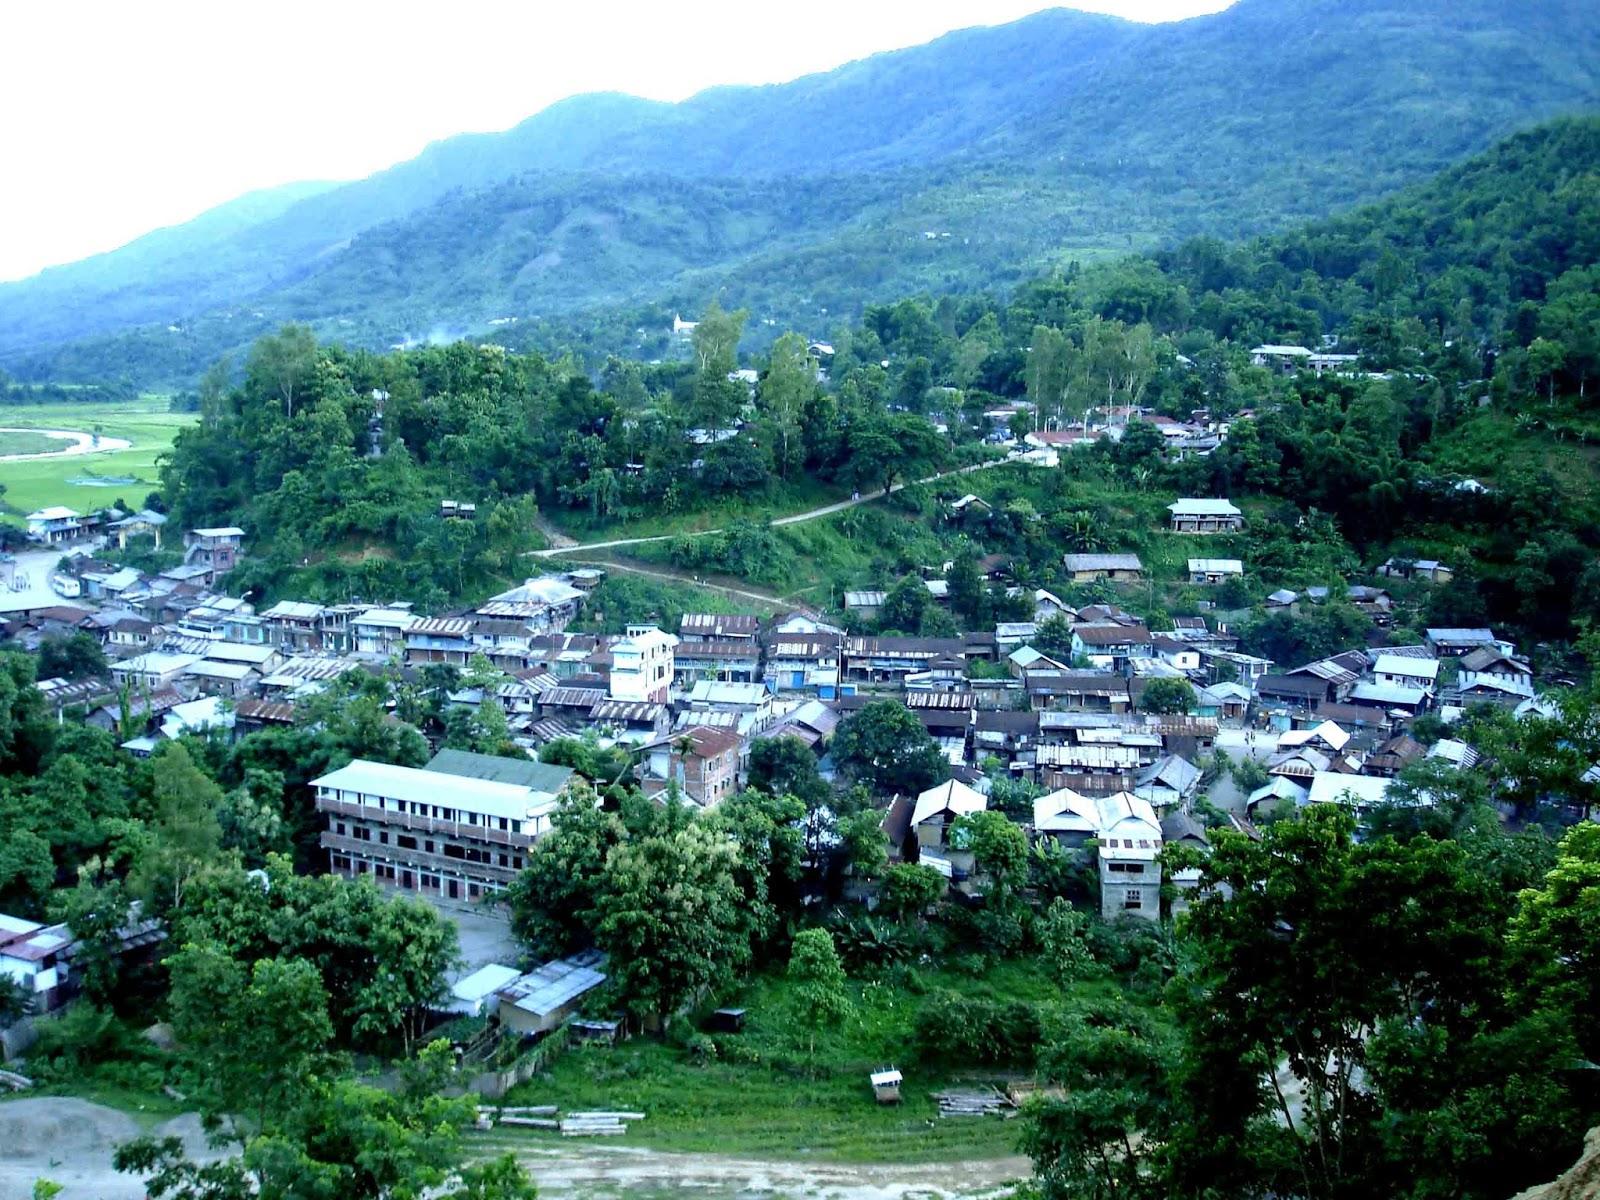 Noney, Manipur. (Source: Kameshore Blogspot)